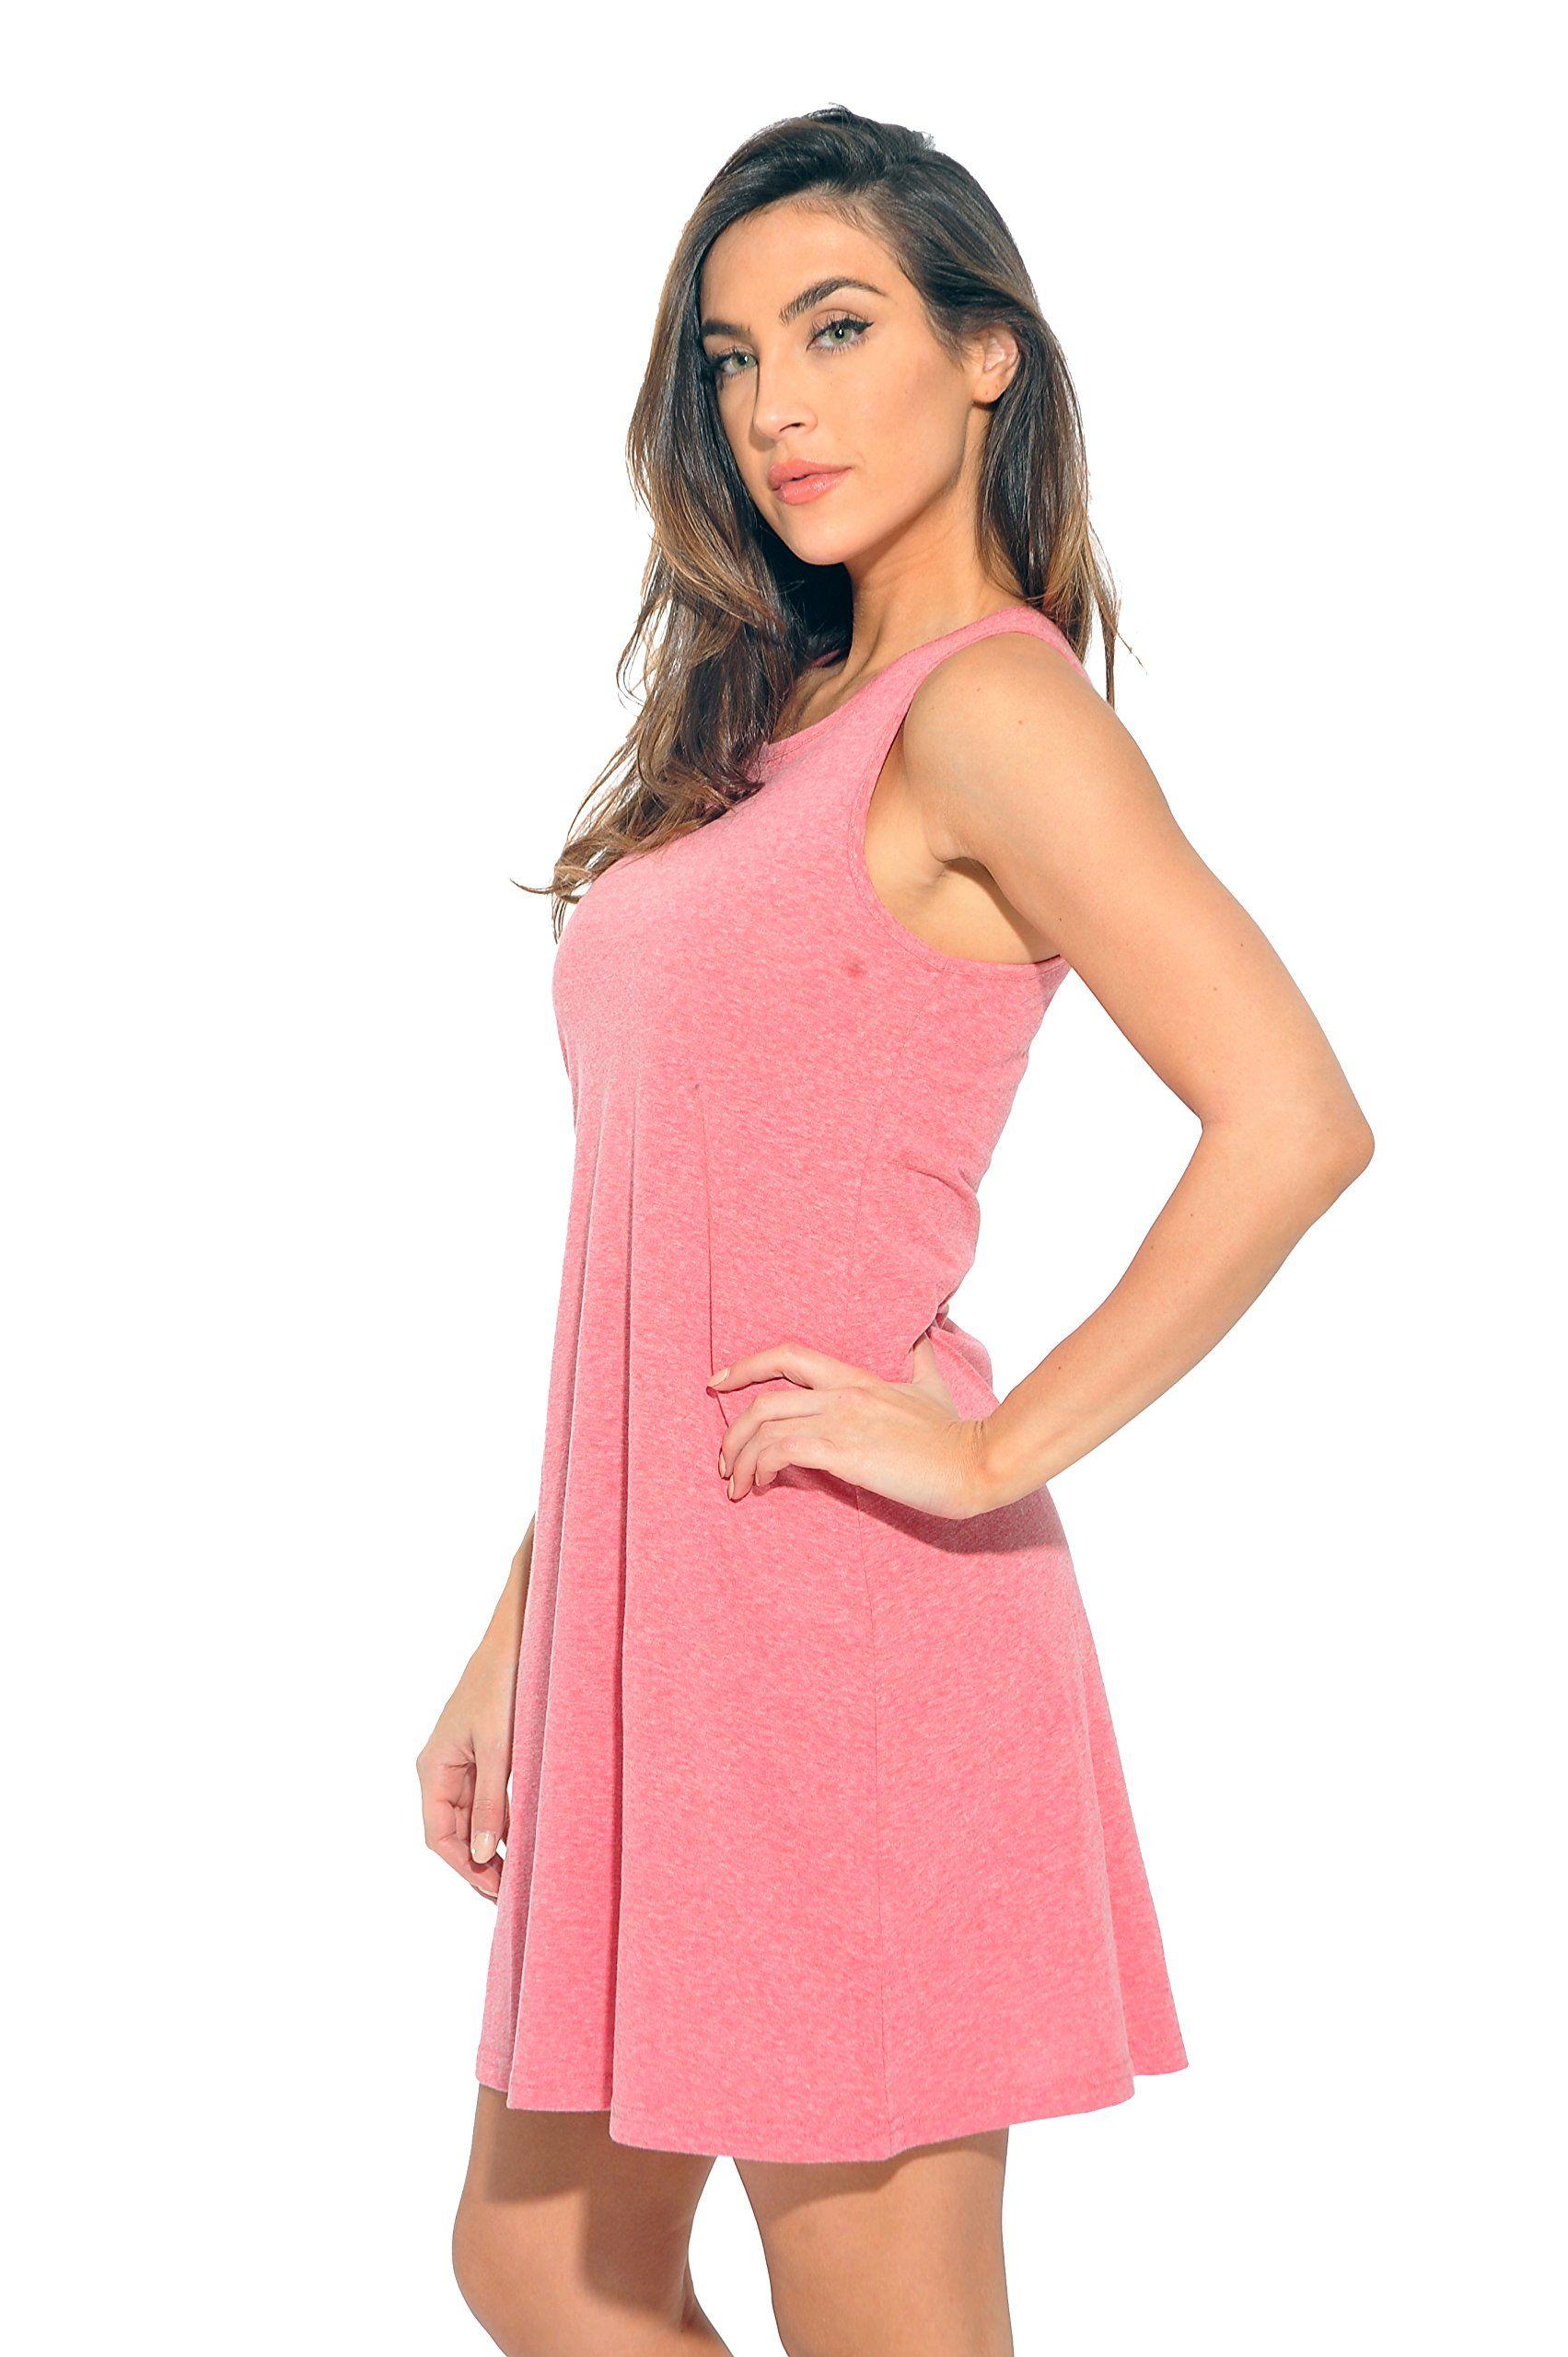 Just Love Just Love Short Dress Summer Dresses Heathered Red X Large Walmart Com In 2020 Short Dresses Cute Casual Dresses Summer Dresses [ 2560 x 1703 Pixel ]